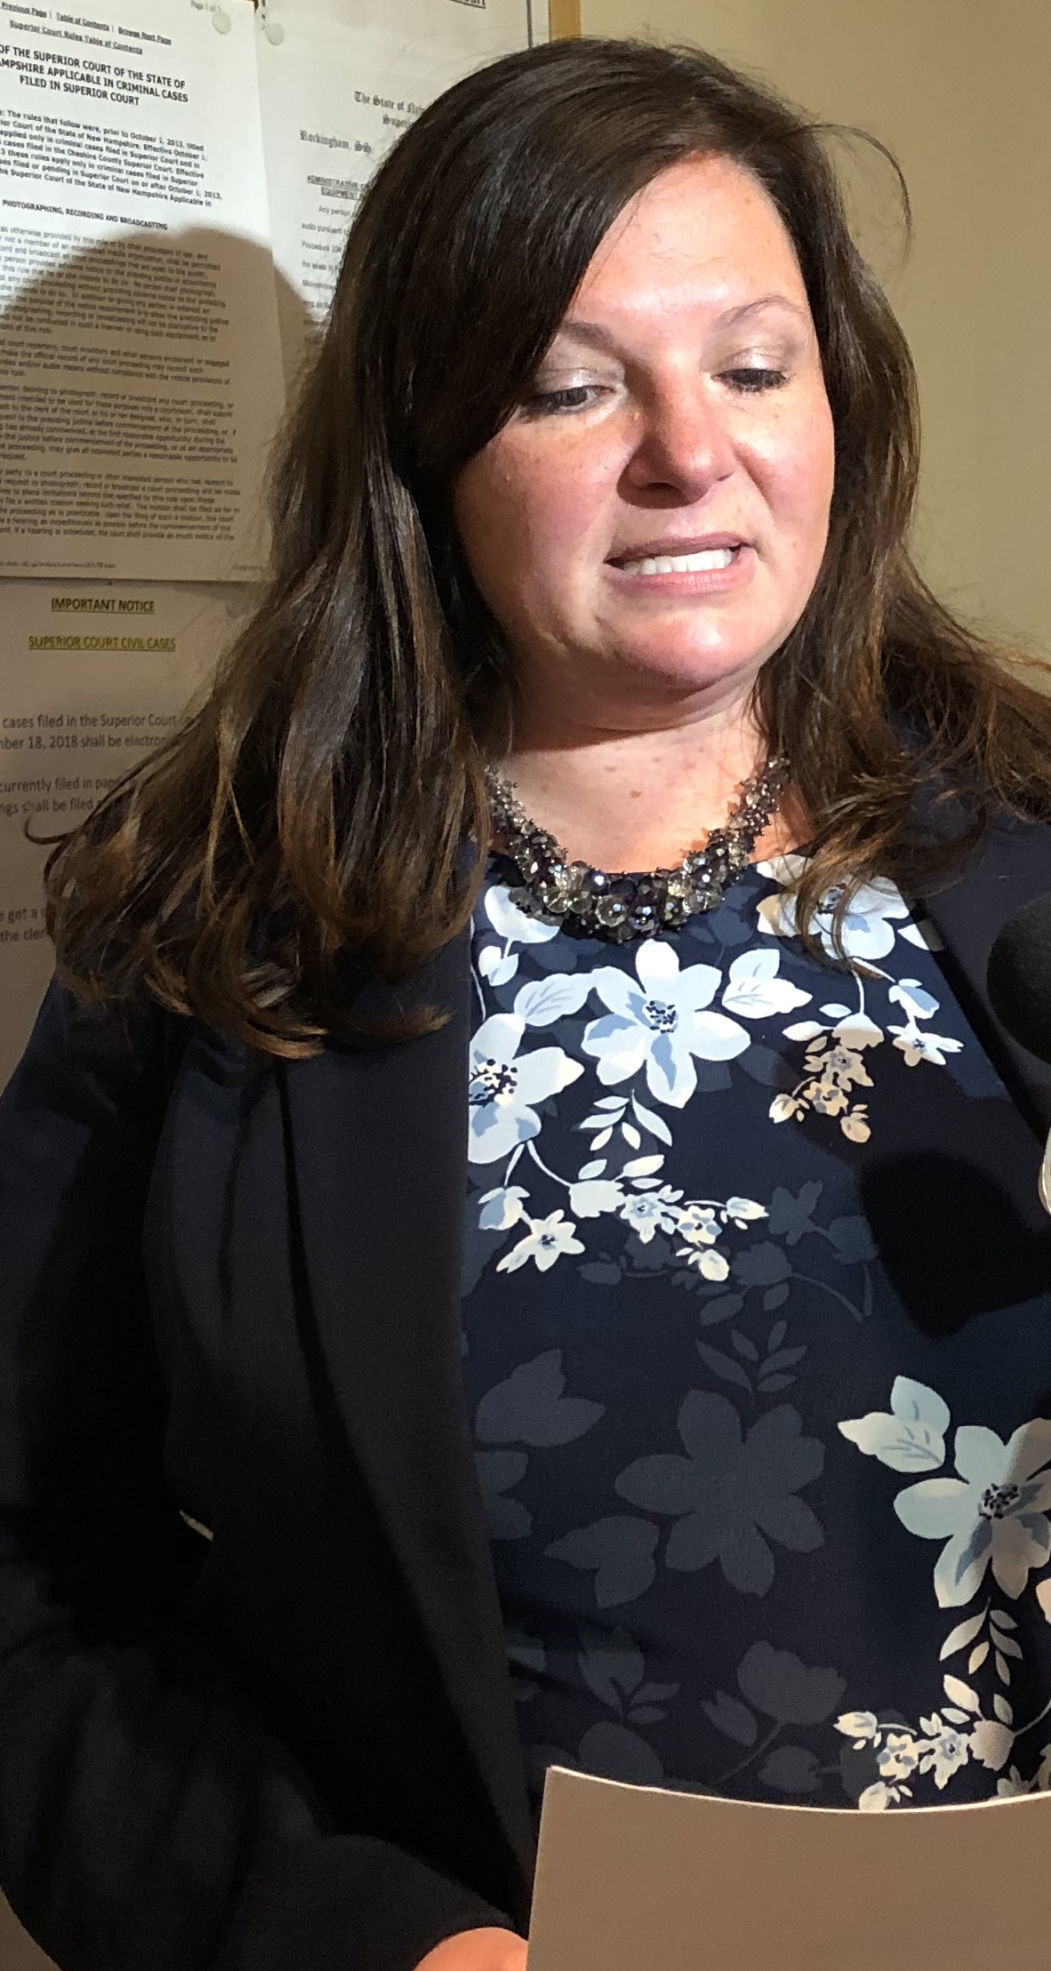 Prosecutor Jennifer Haggar